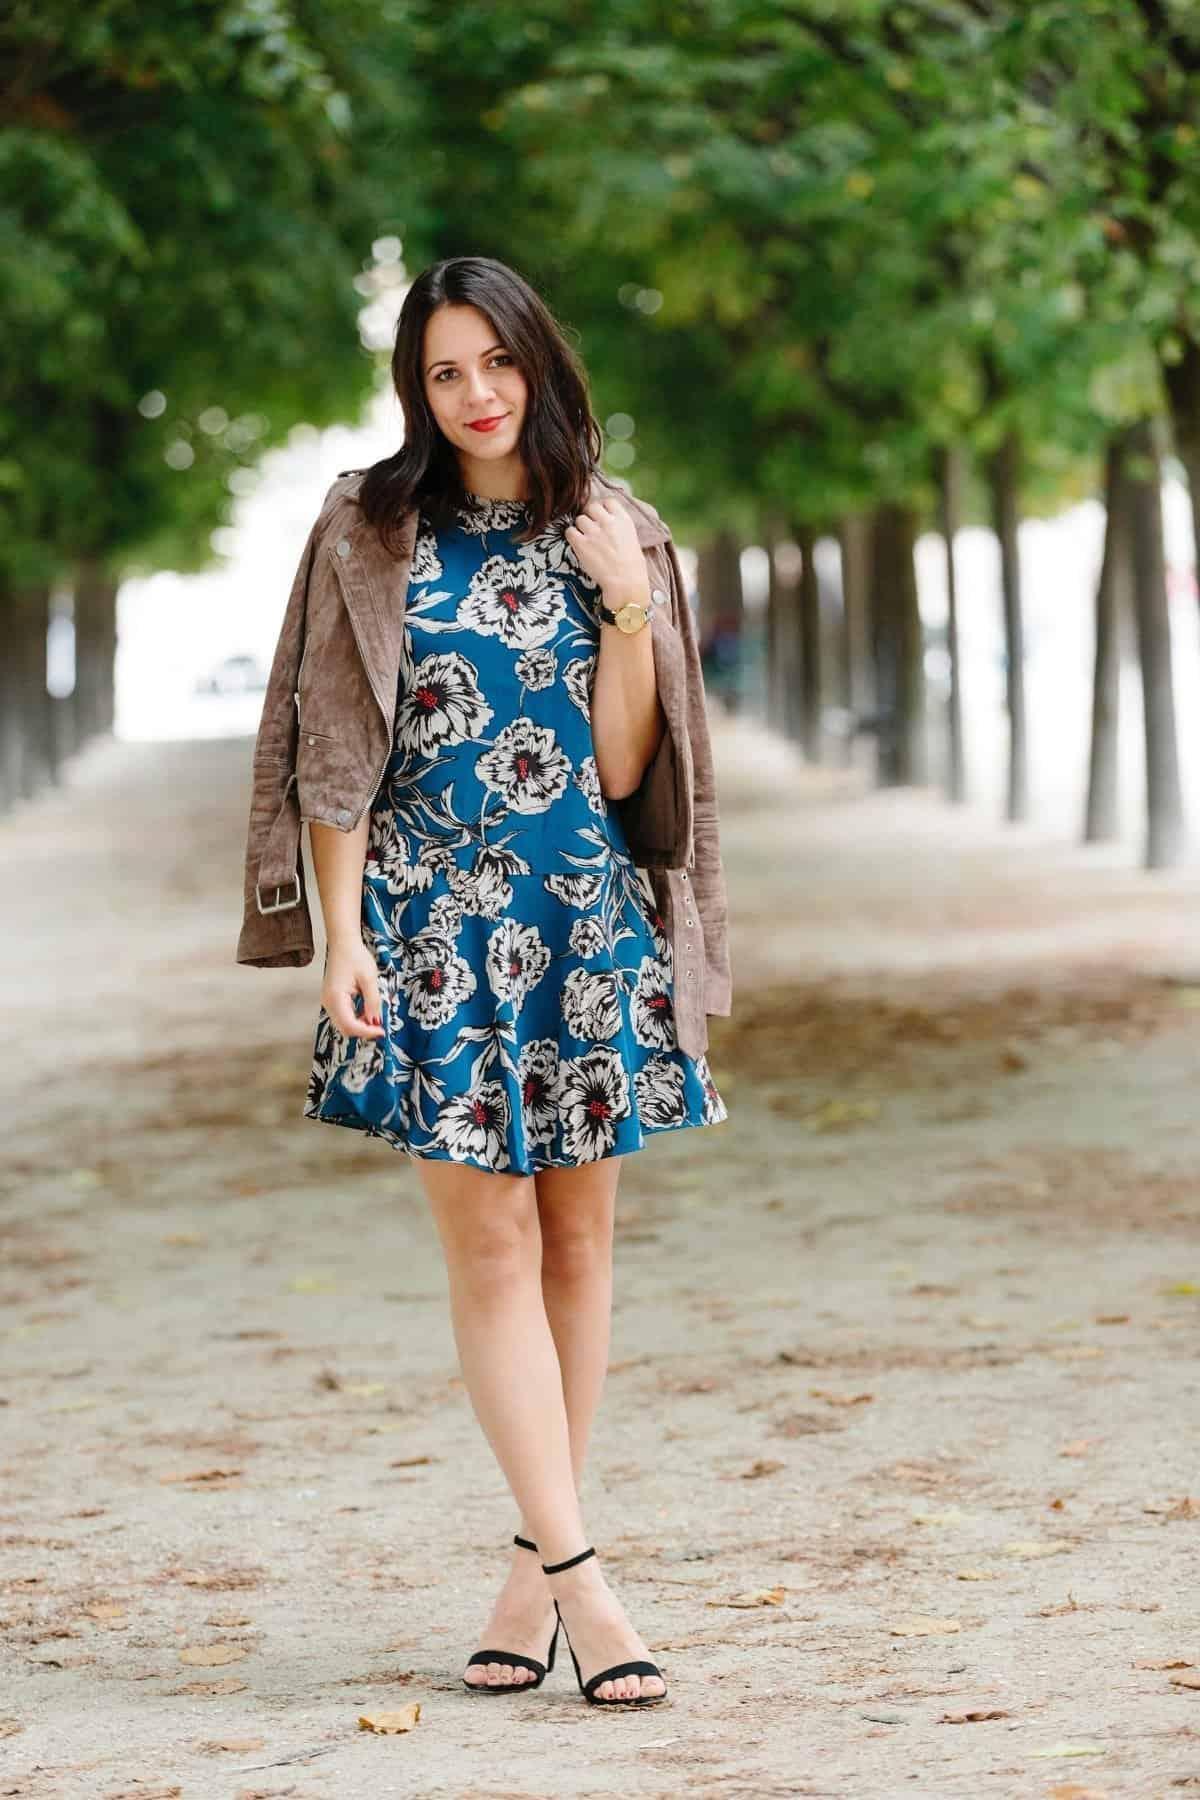 Cooper and Ella dress, paris date night looks, paris outfit ideas - My Style Vita @mystylevita